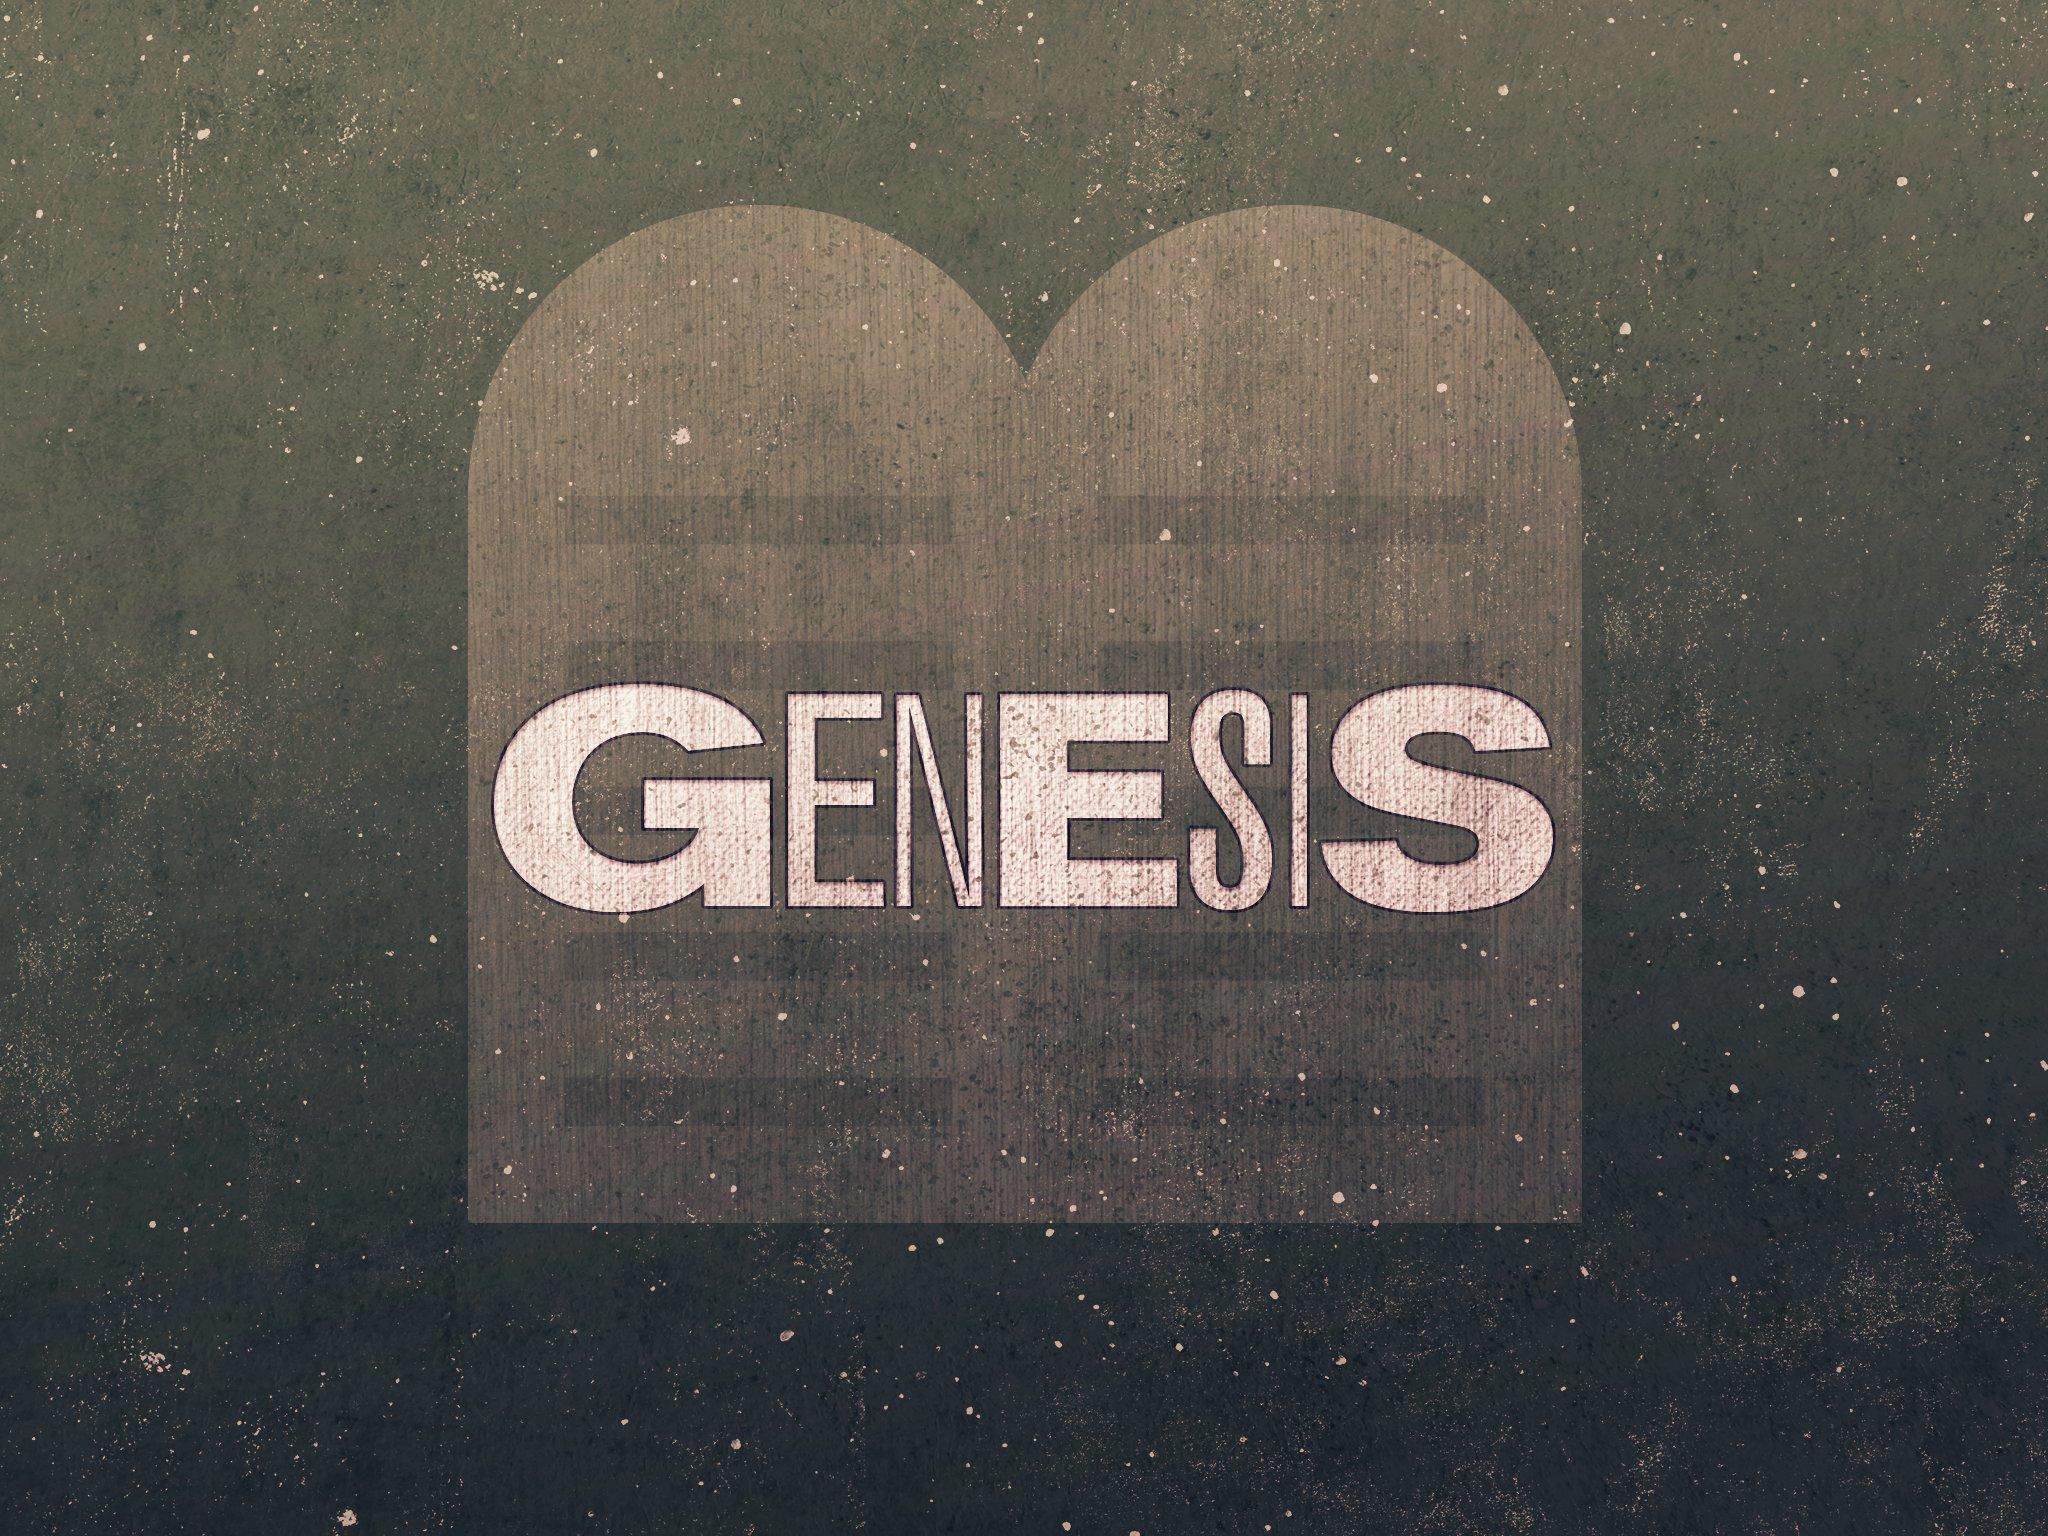 01-Genesis_Title_4x3-fullscreen.jpg